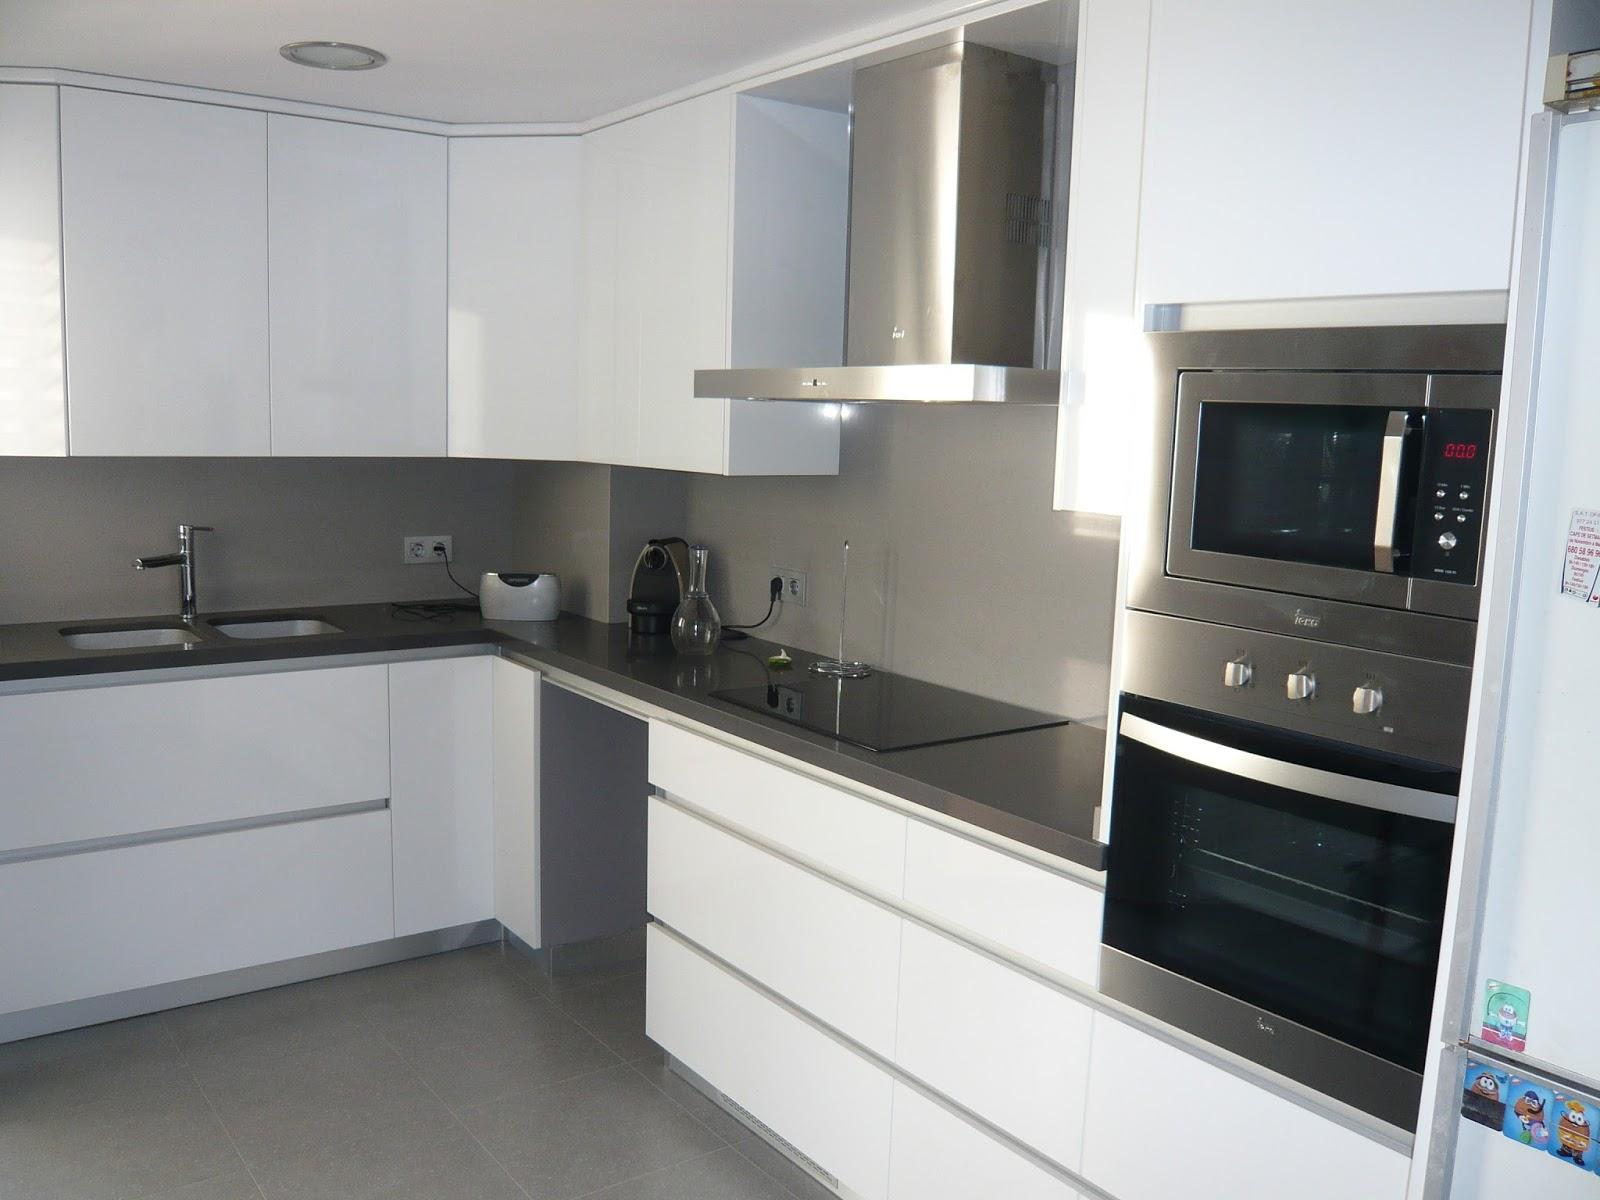 Reuscuina muebles de cocina sin tiradores con vidriera decorativa y mesa auxiliar - Cocina sin tiradores ...